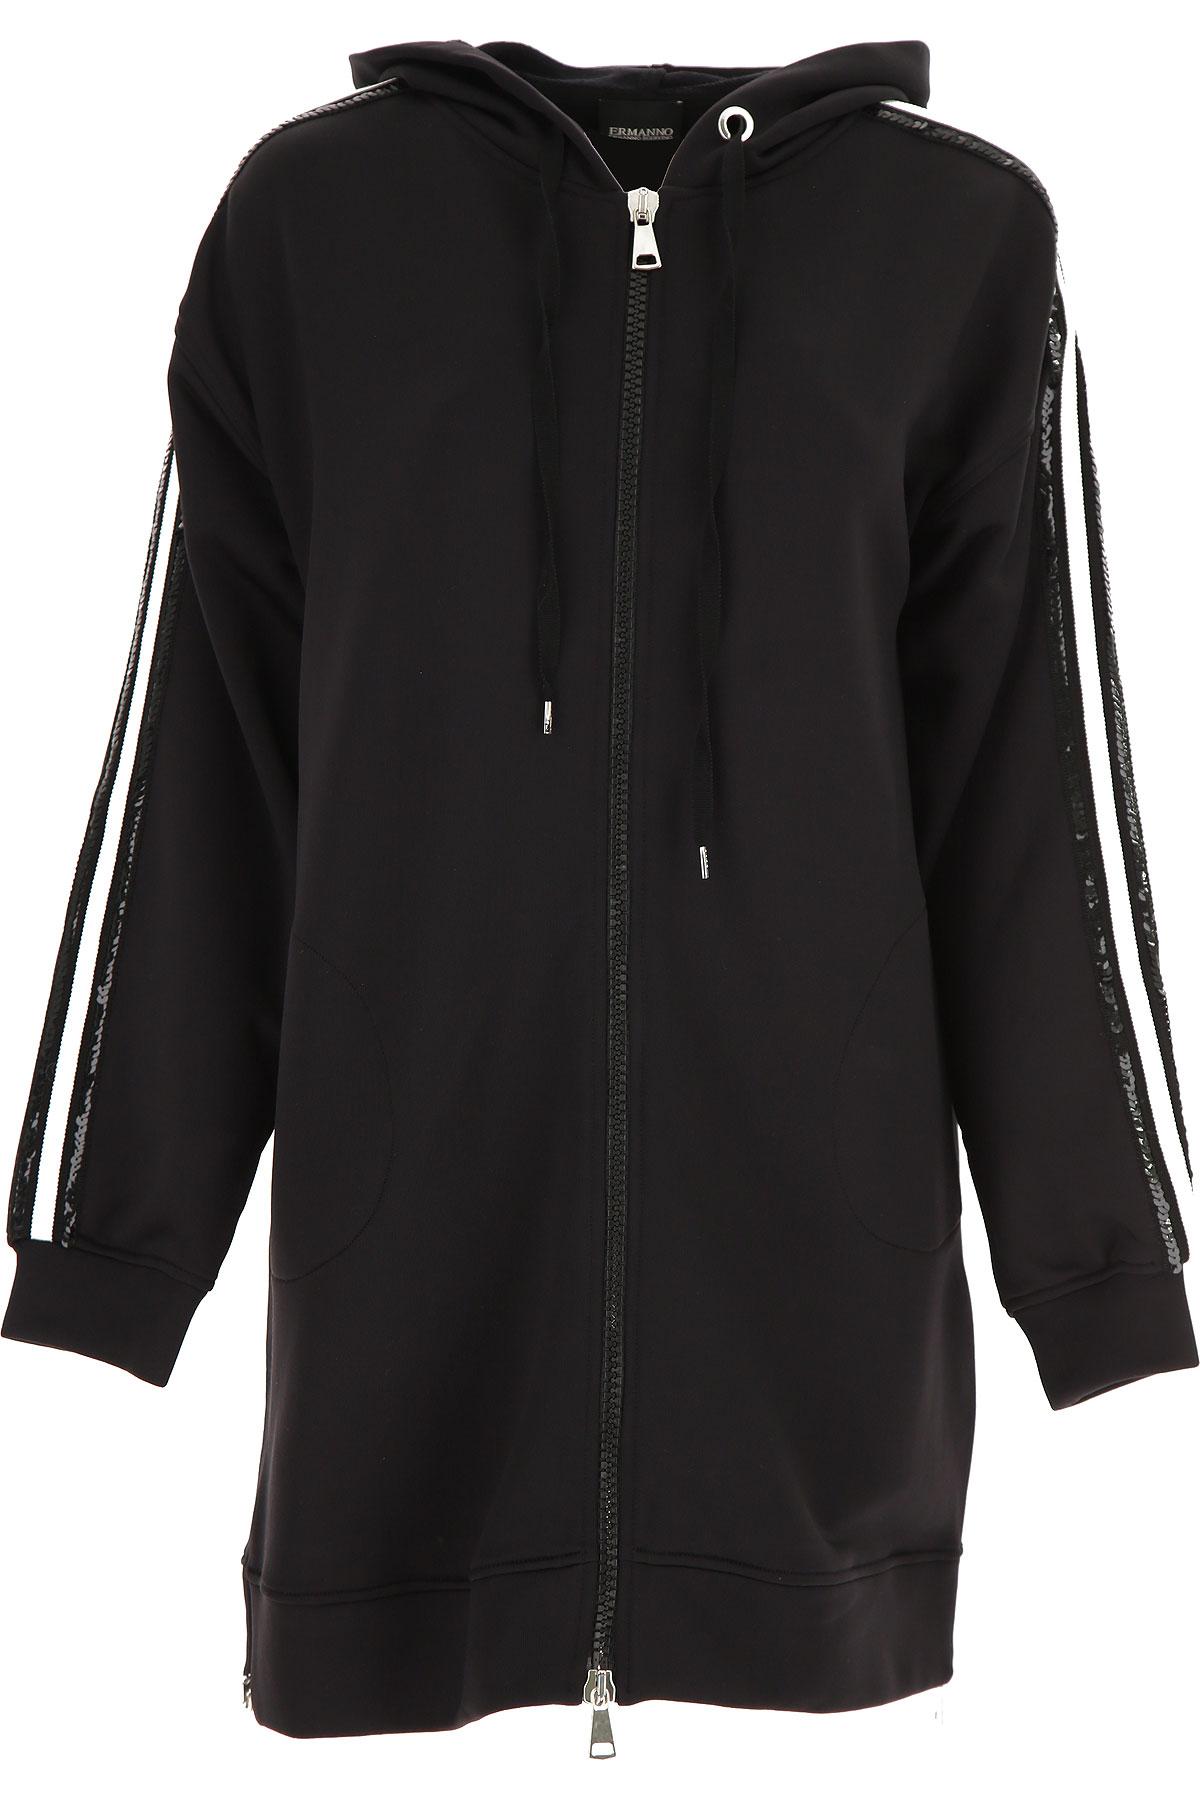 Ermanno Scervino Sweatshirt for Women On Sale, Black, polyester, 2019, 4 6 8